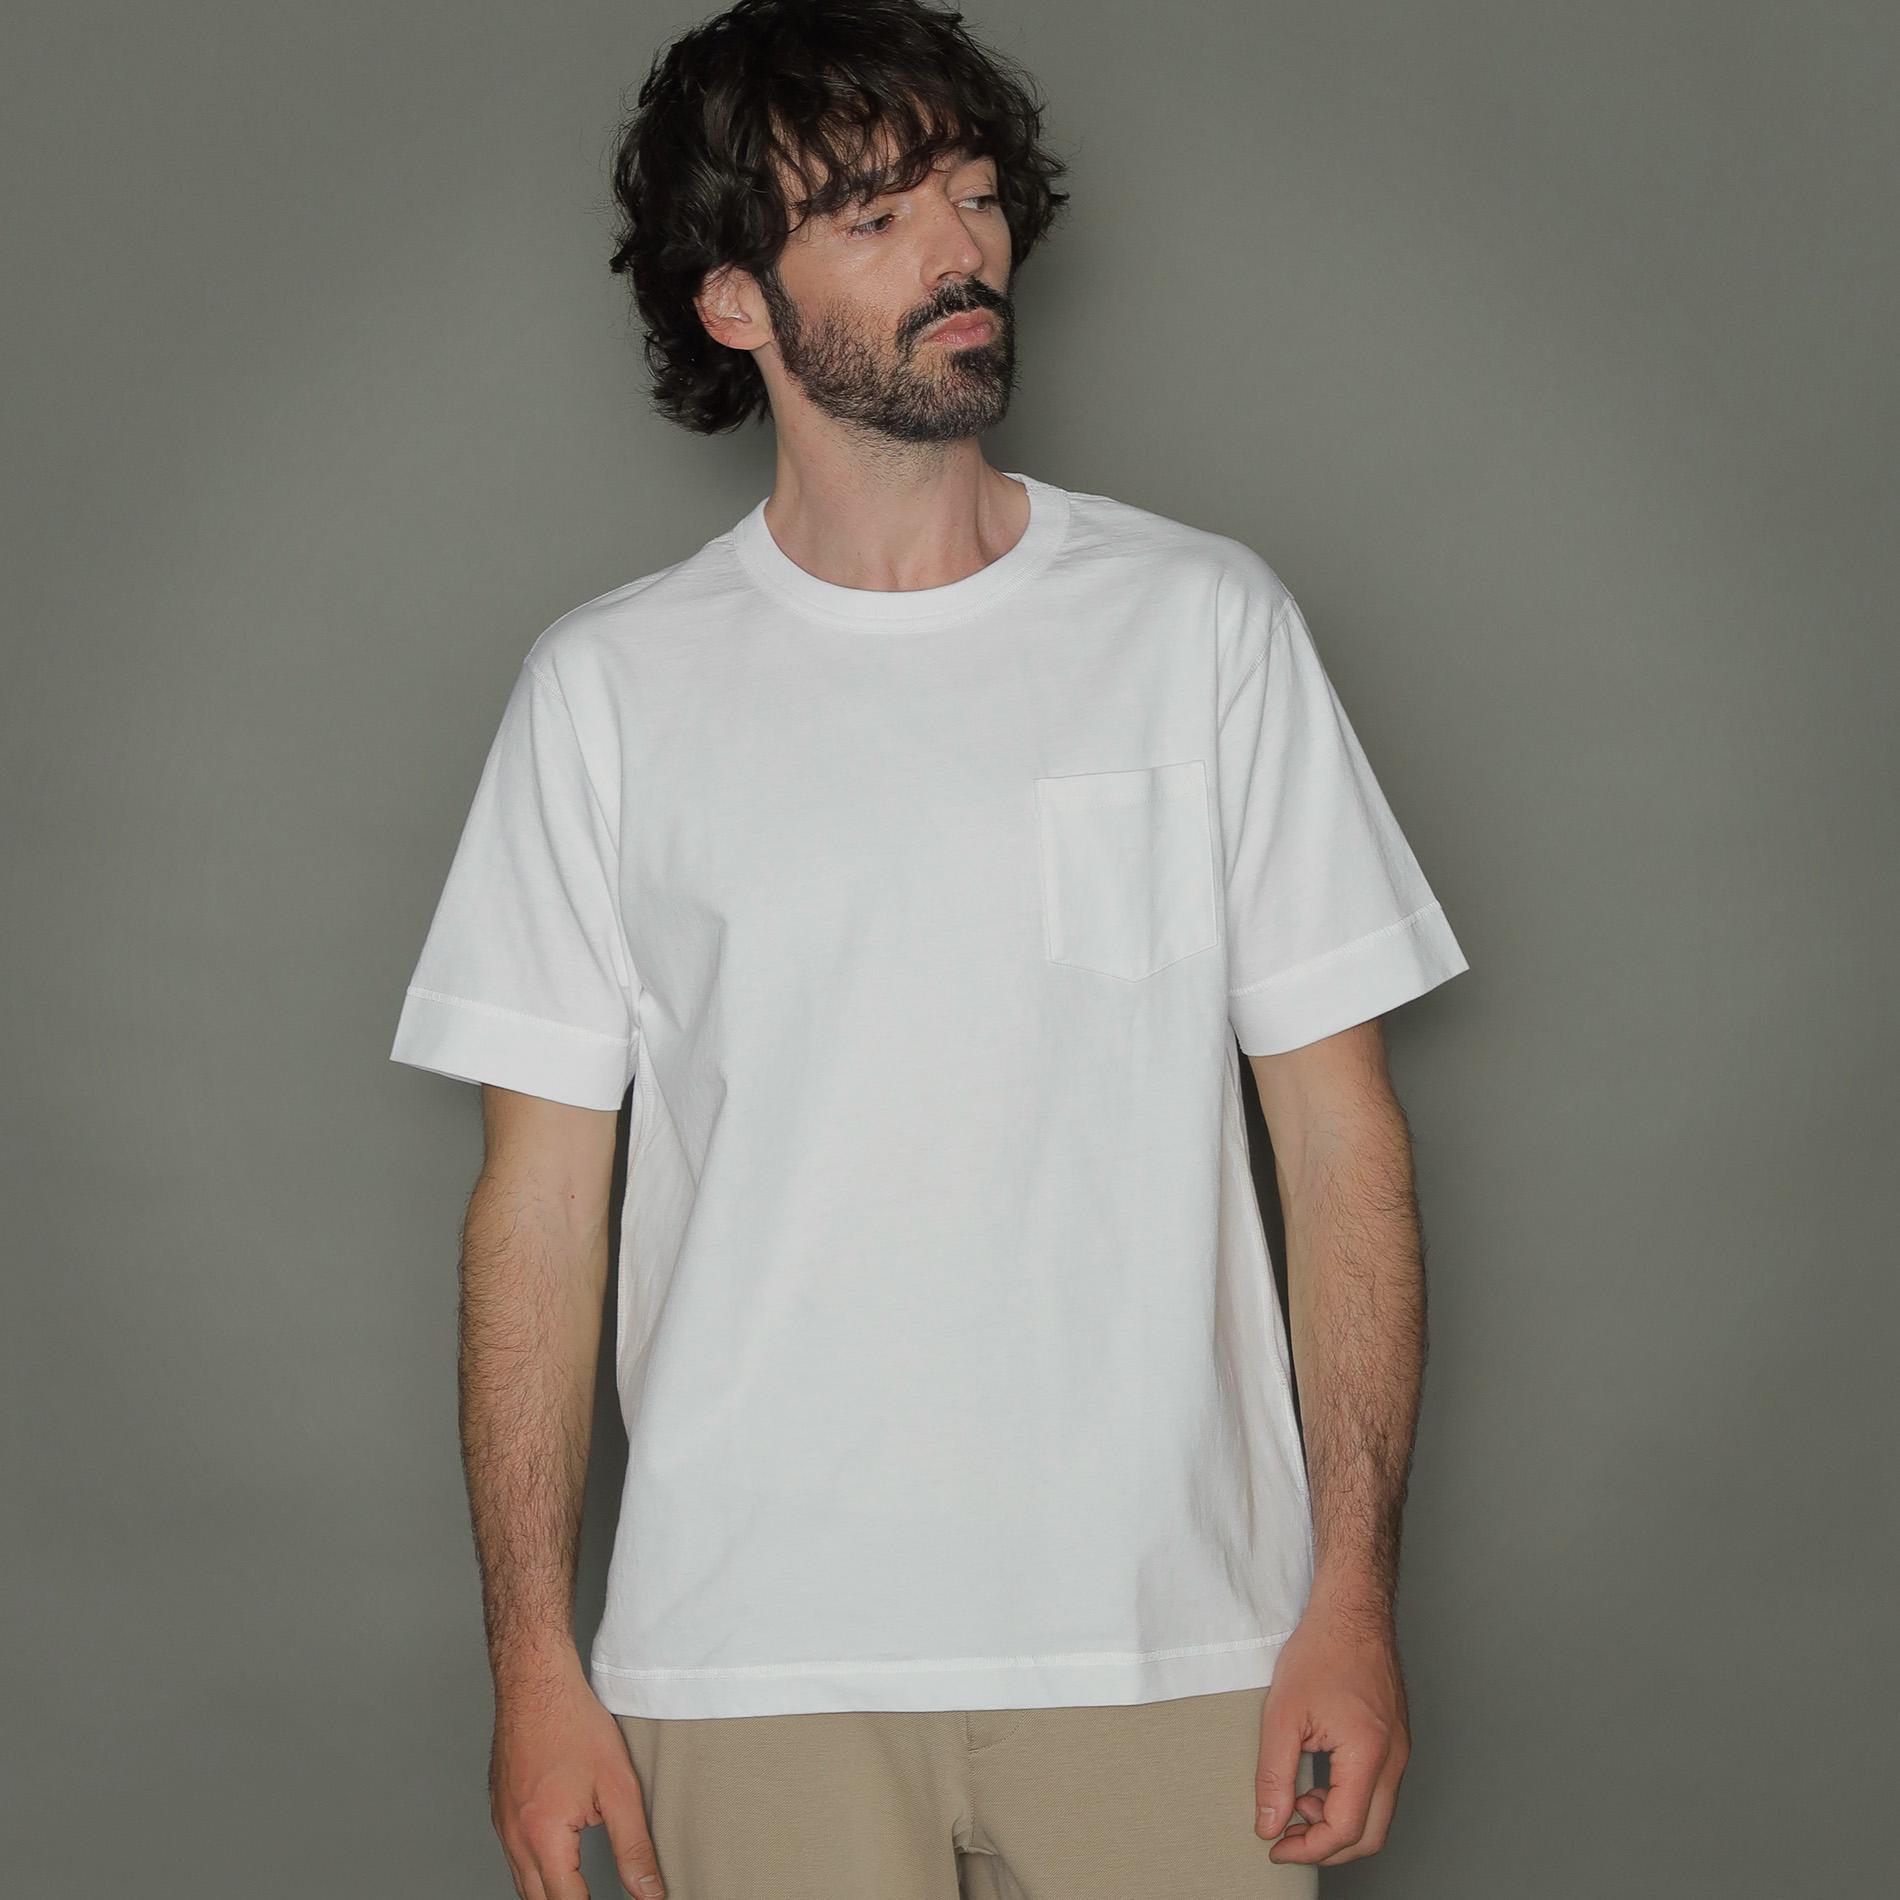 ◆◆【Healthknit】コラボポケットTシャツ